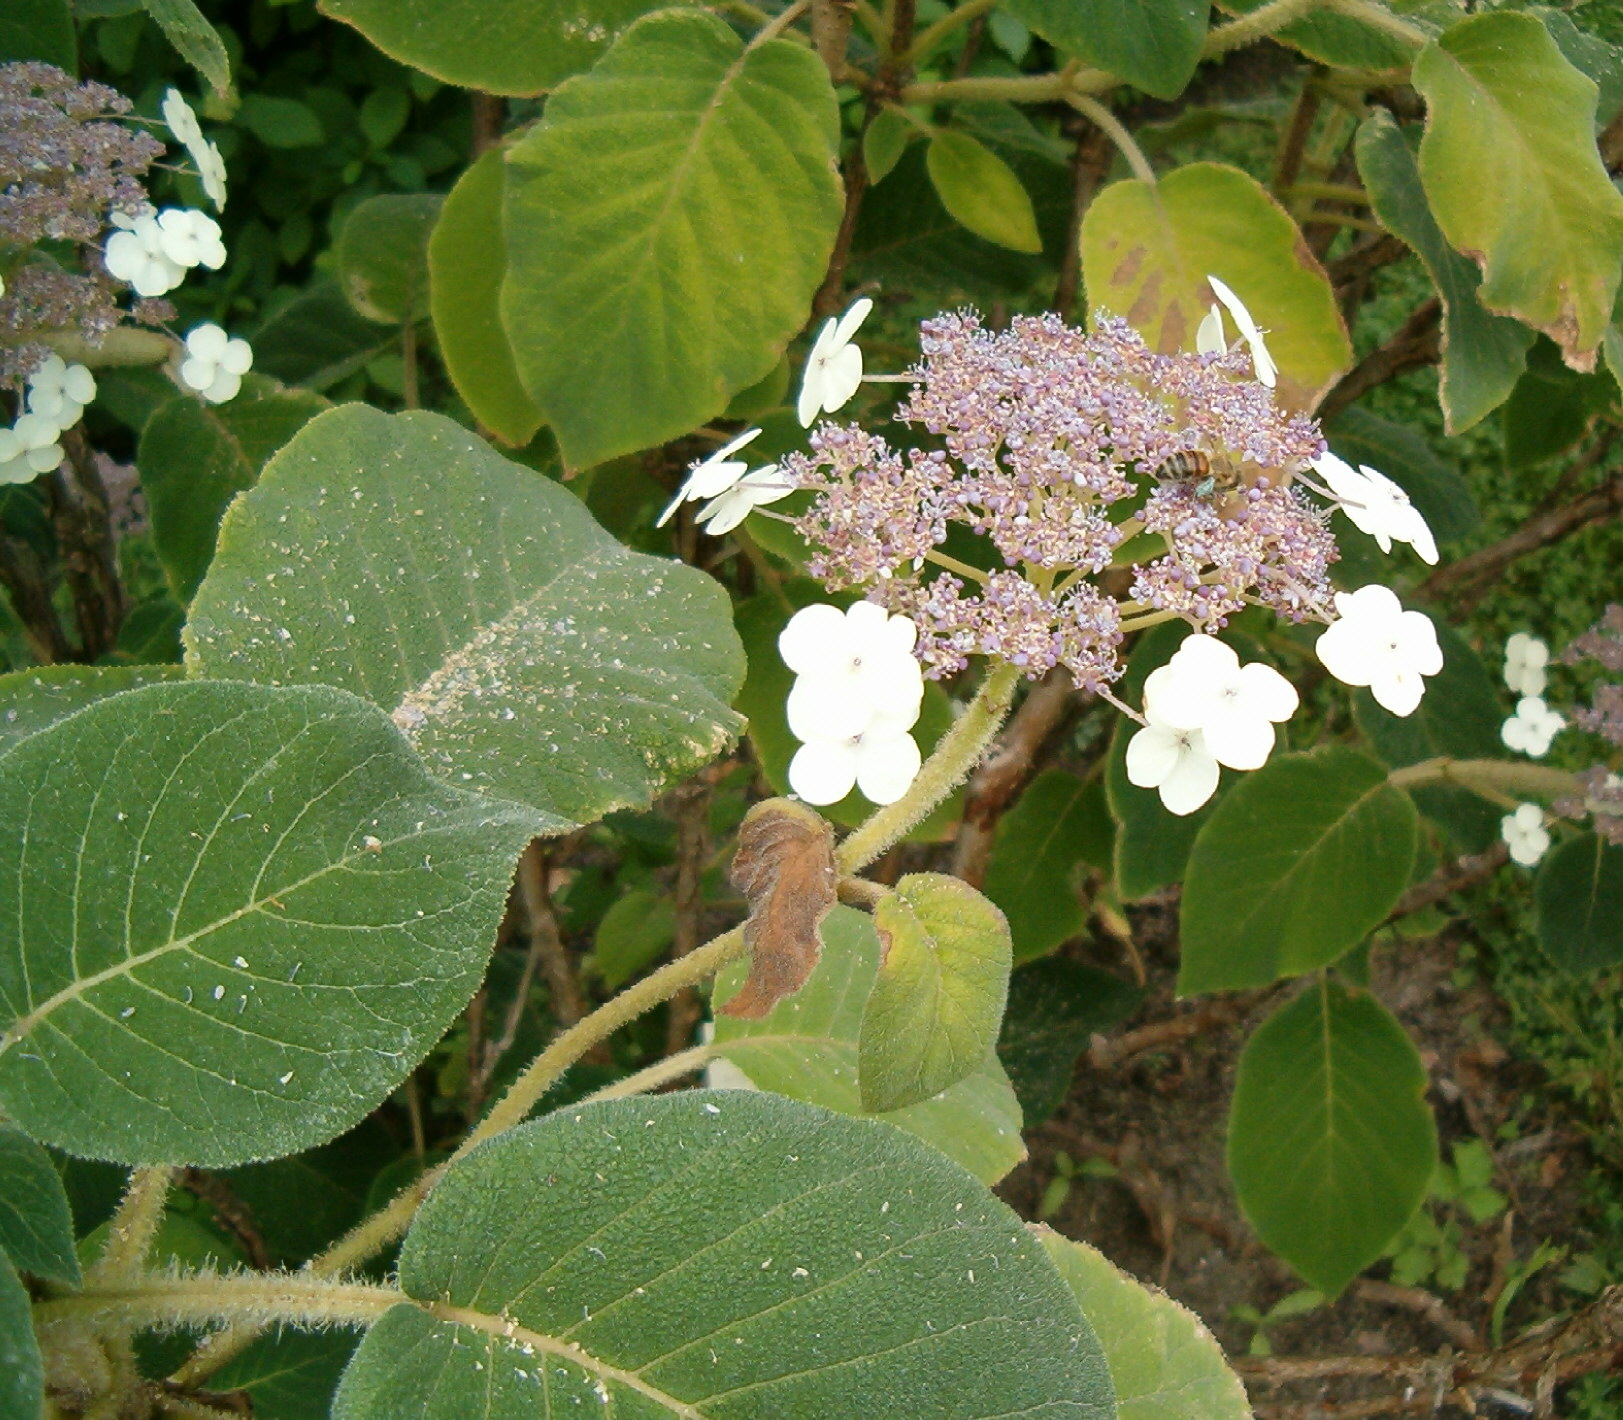 file hydrangea aspera sargentiana leavesinflorescence wikimedia commons. Black Bedroom Furniture Sets. Home Design Ideas